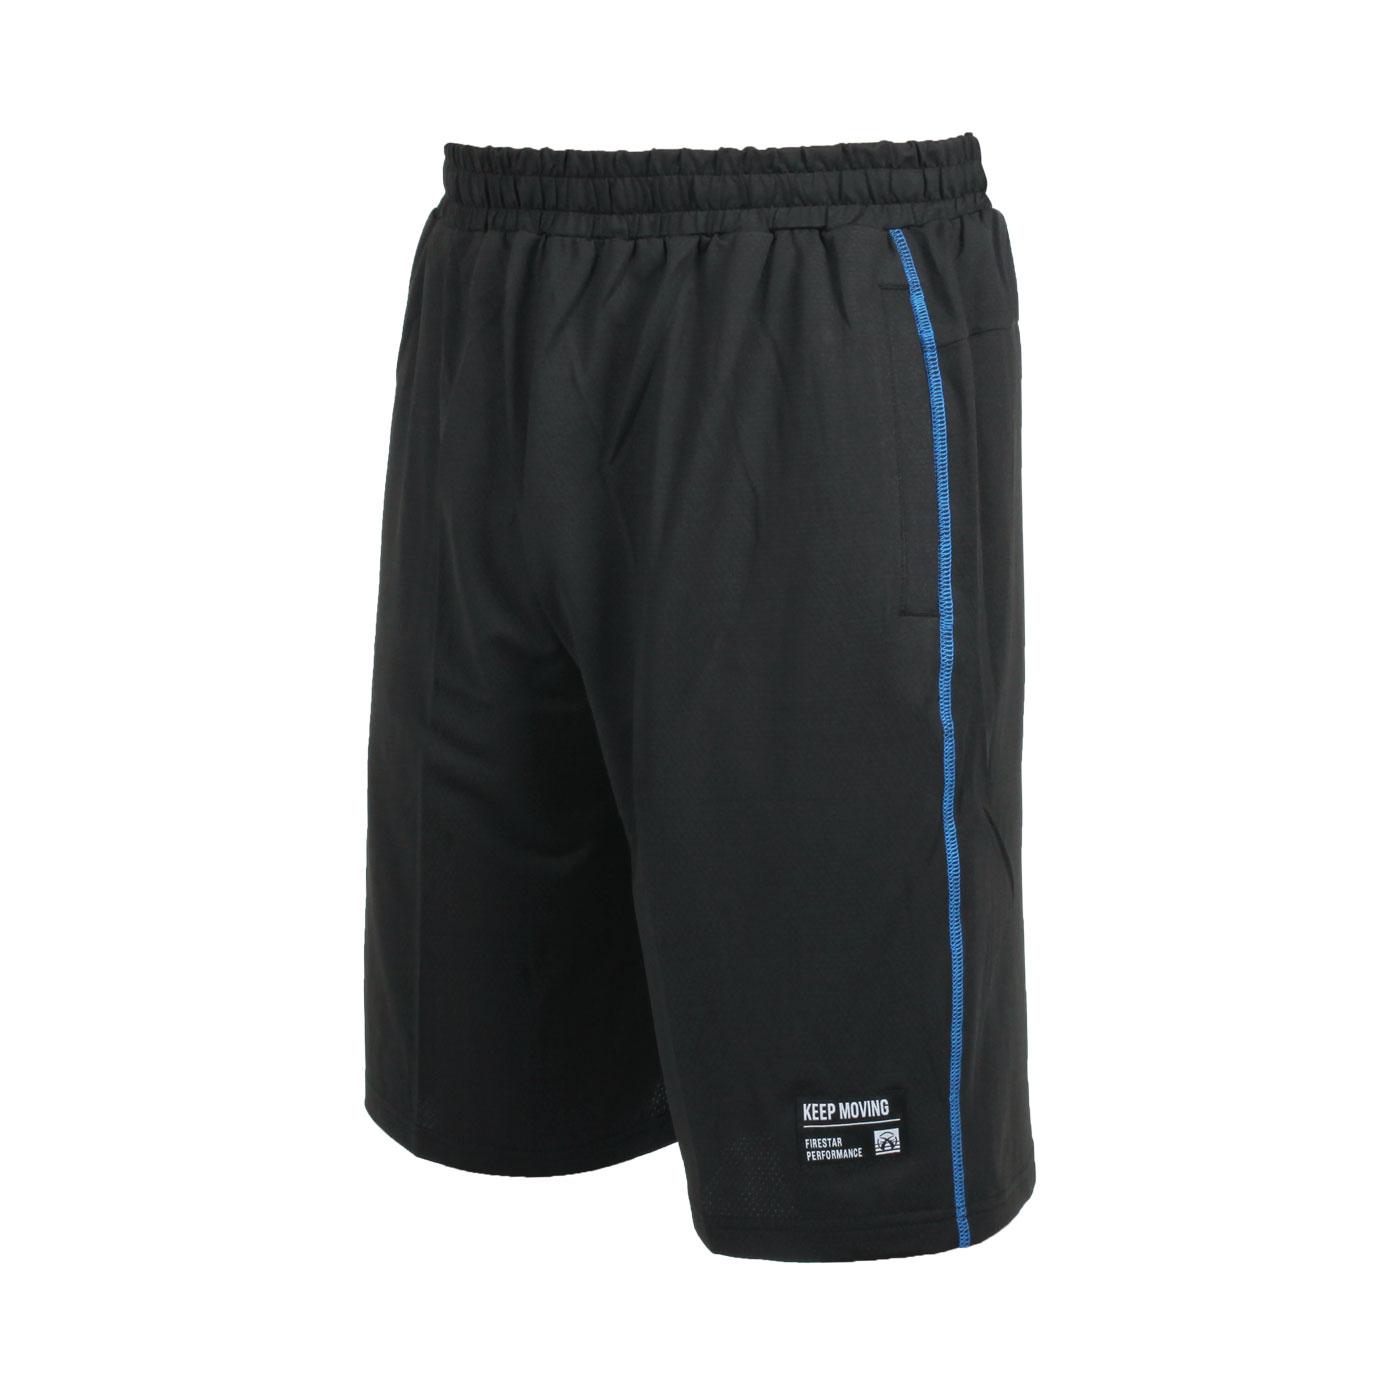 FIRESTAR 男款彈性訓練籃球短褲 B1705-92